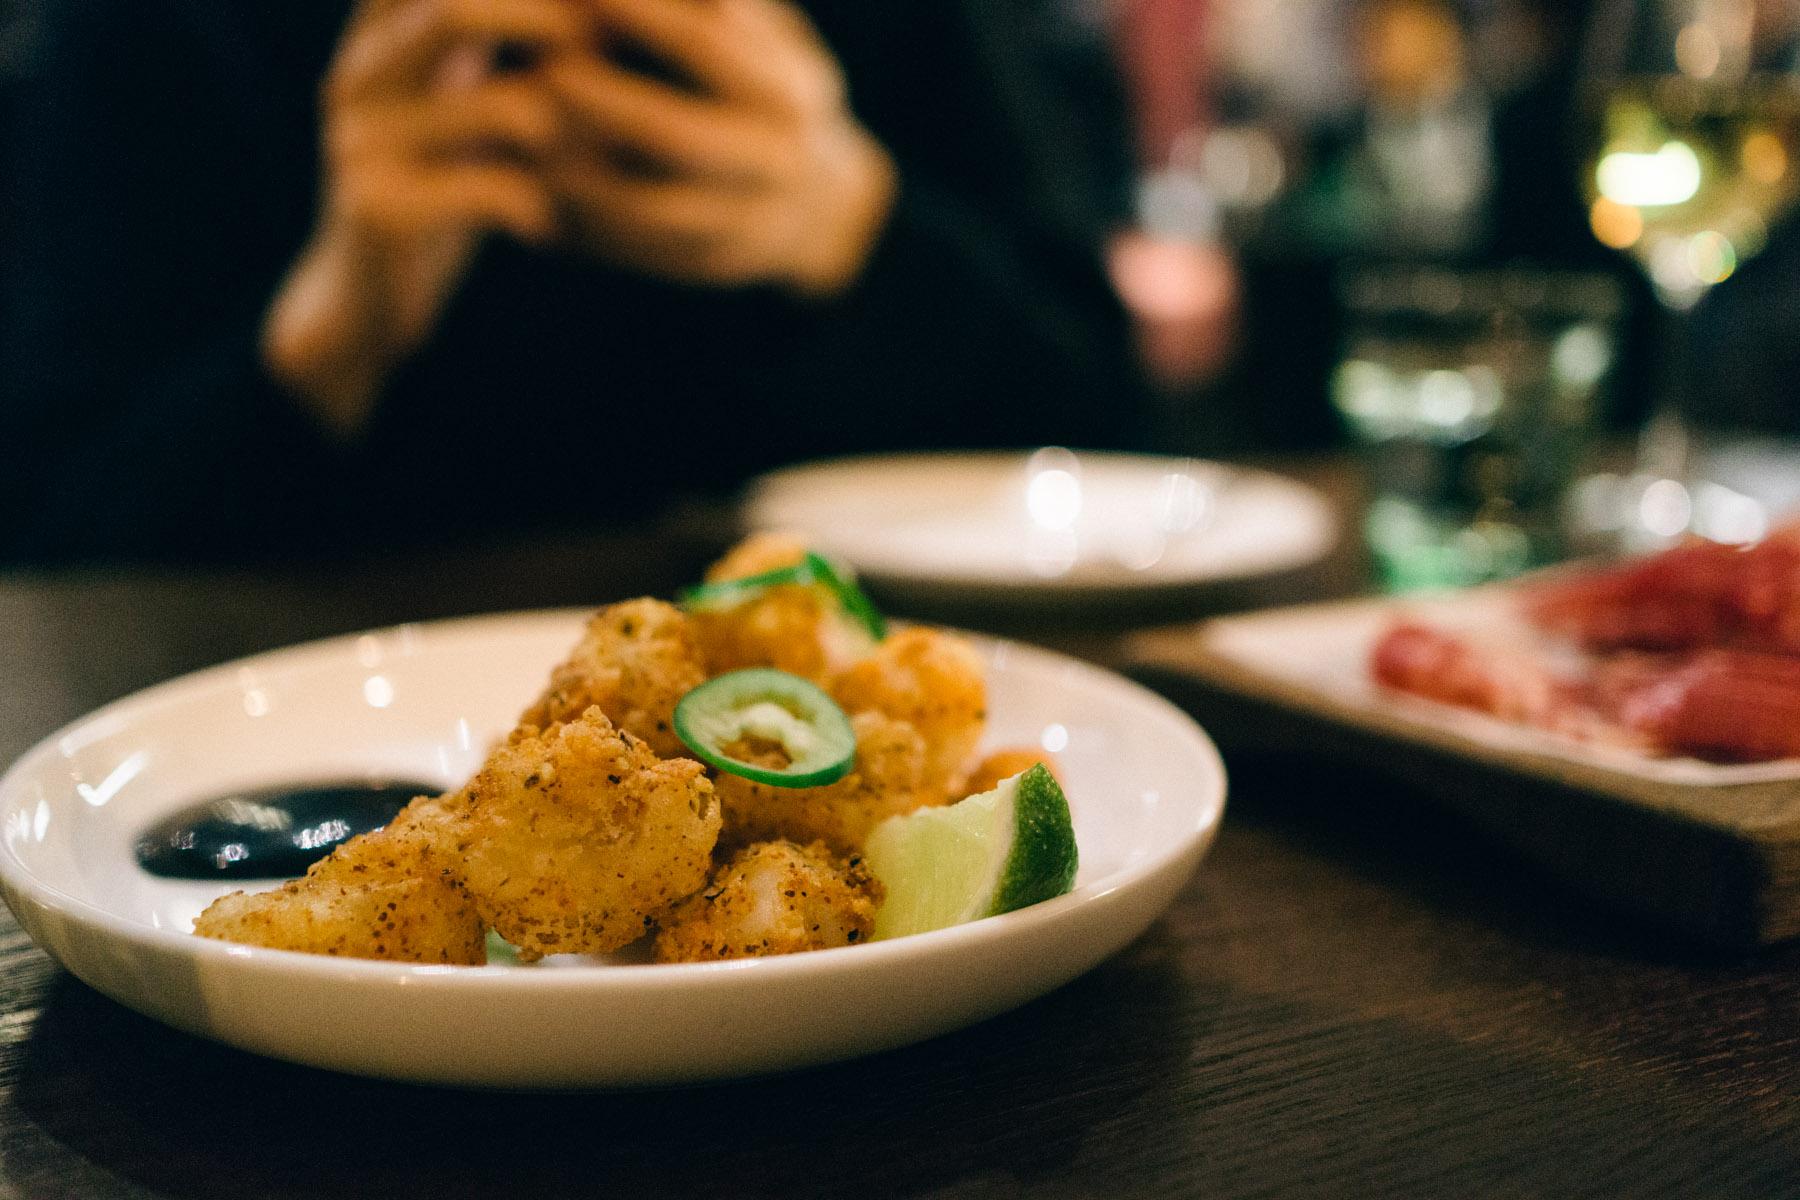 ham-and-sherry-spanish-tapas-ship-street-wan-chai-hong-kong-jason-atherton-11